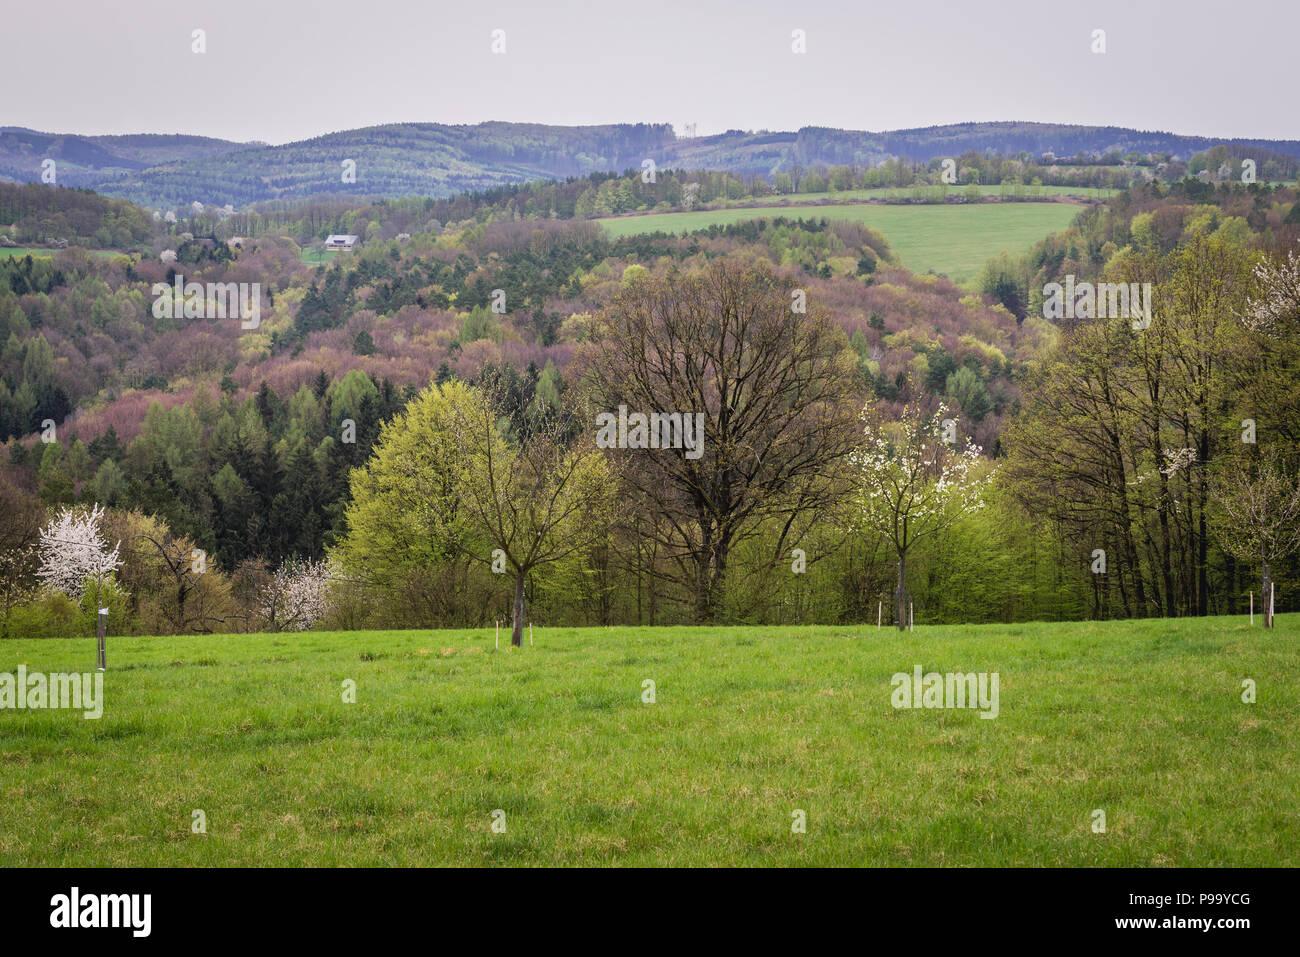 Landscape around Jaroslavice district of Zlin city in Czech Republic - Stock Image